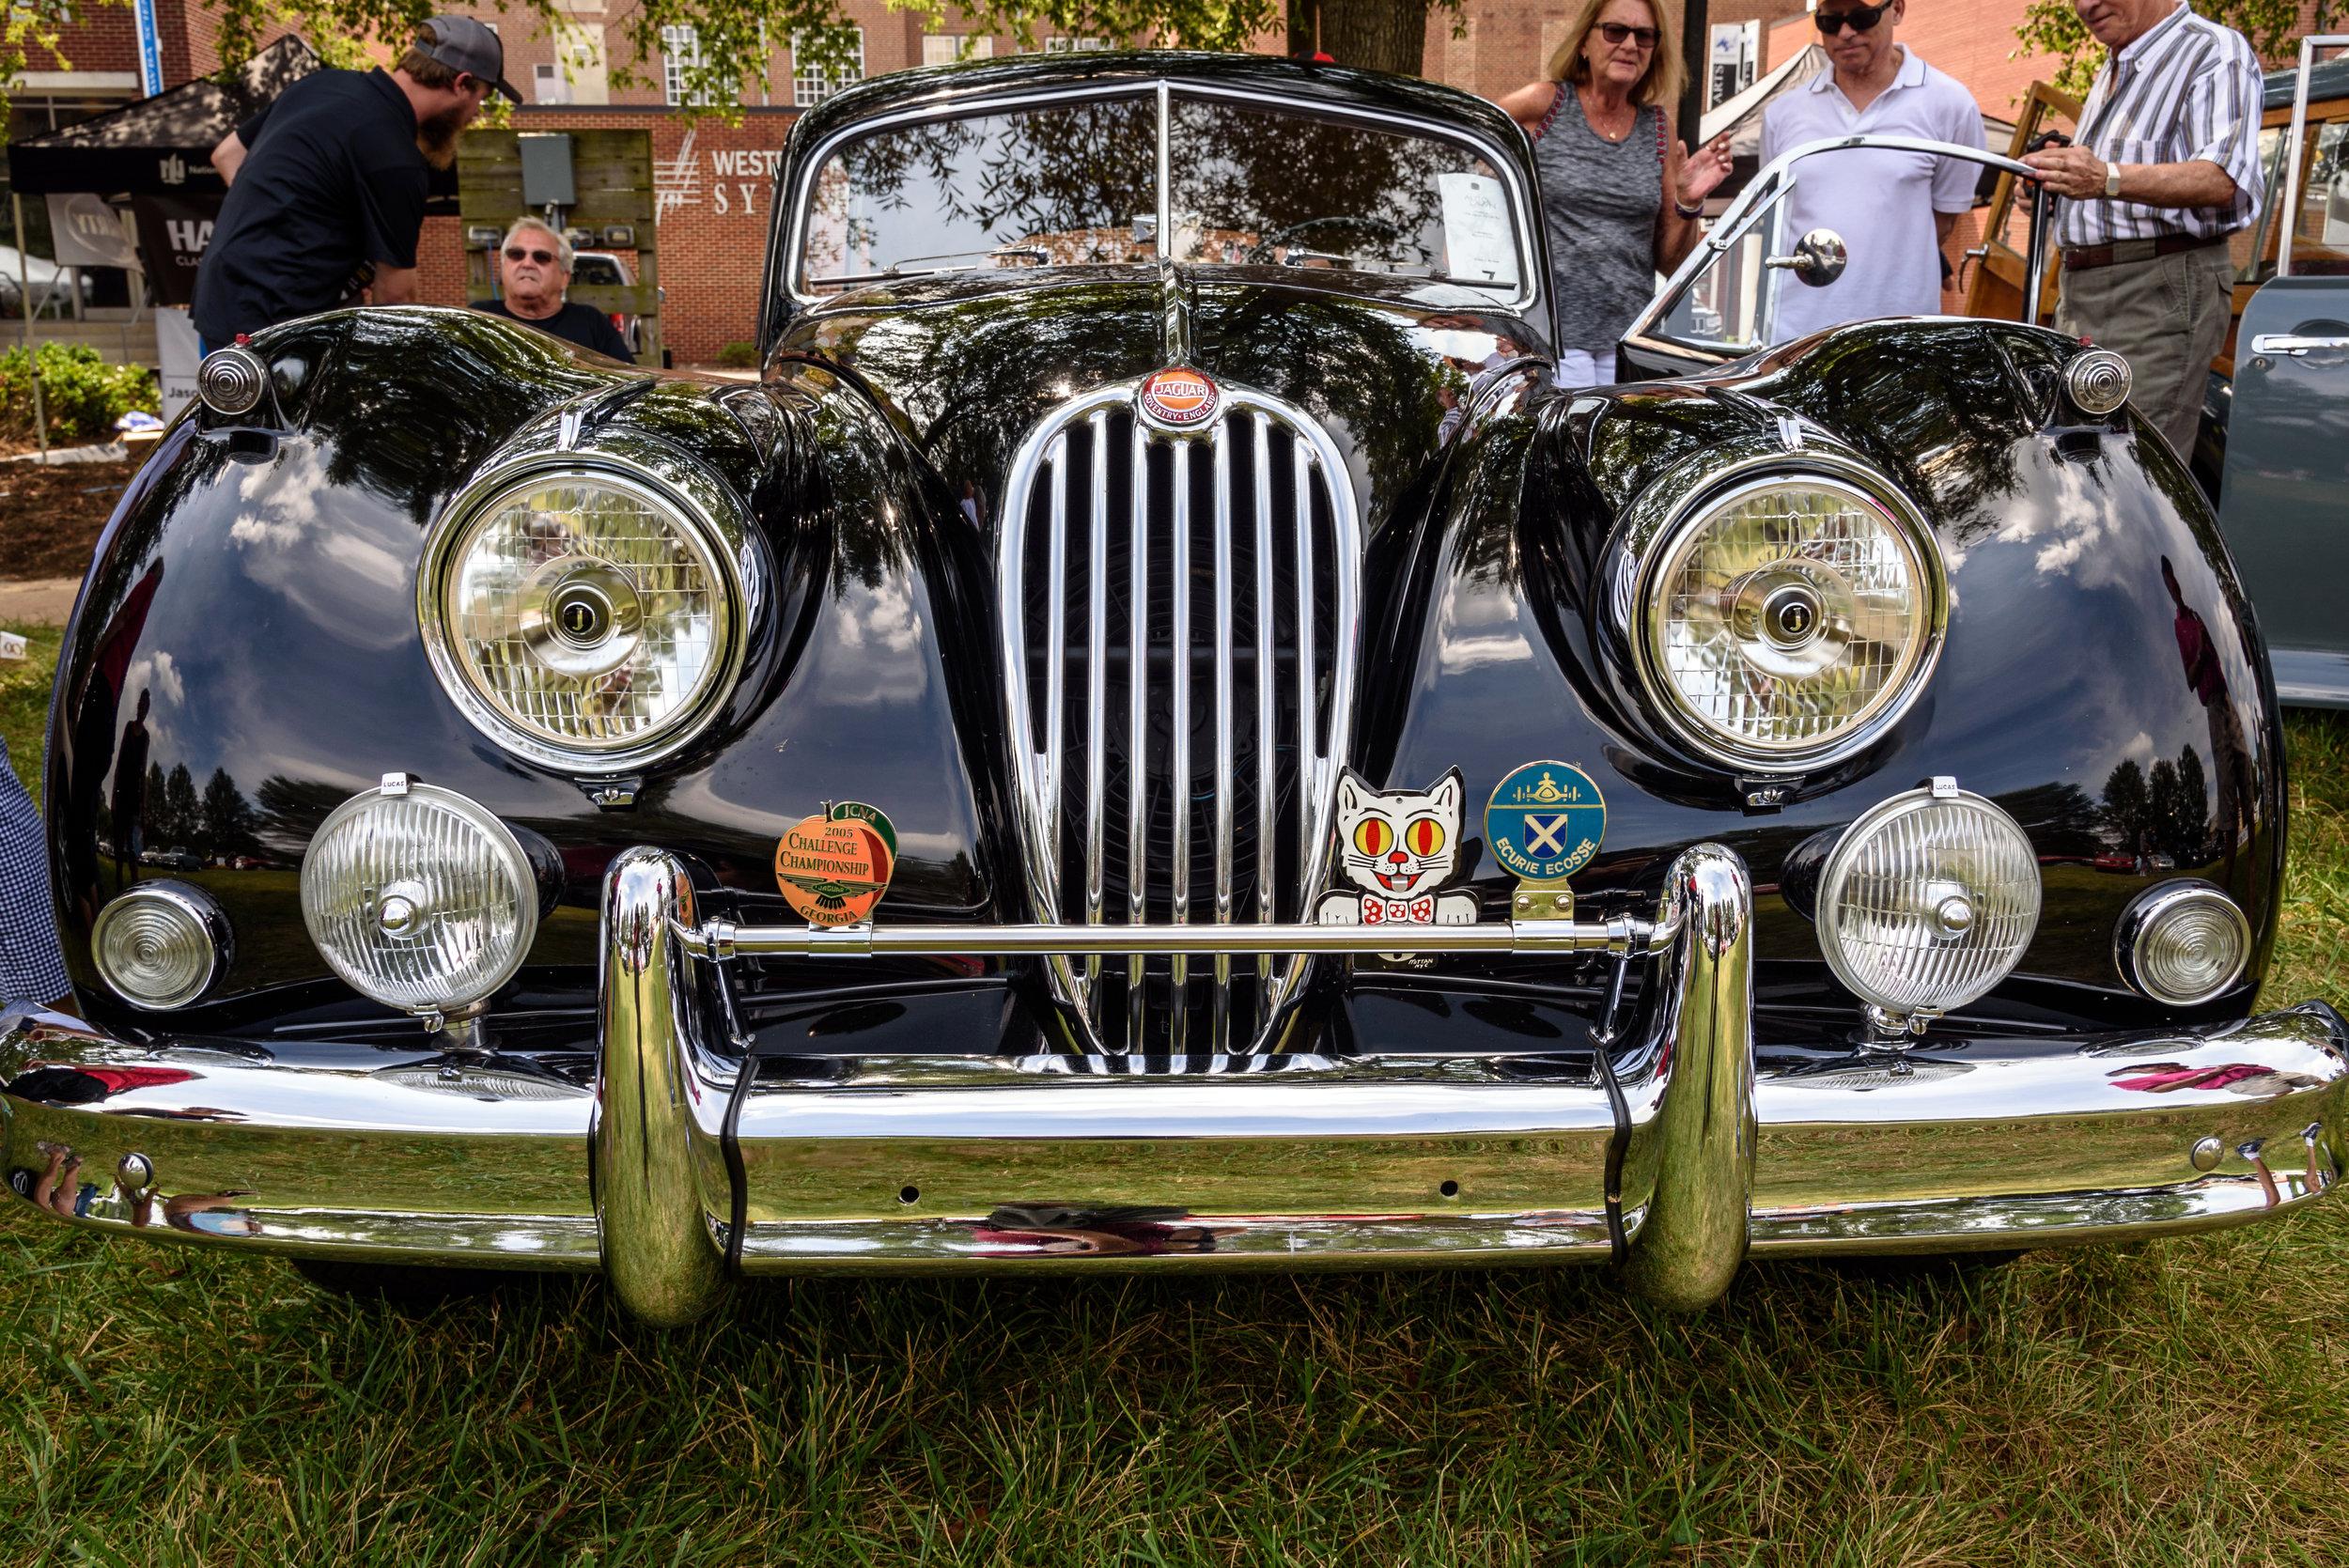 2018-09-09 Autolawn Devlin 1956 Jaguar XK140.jpg